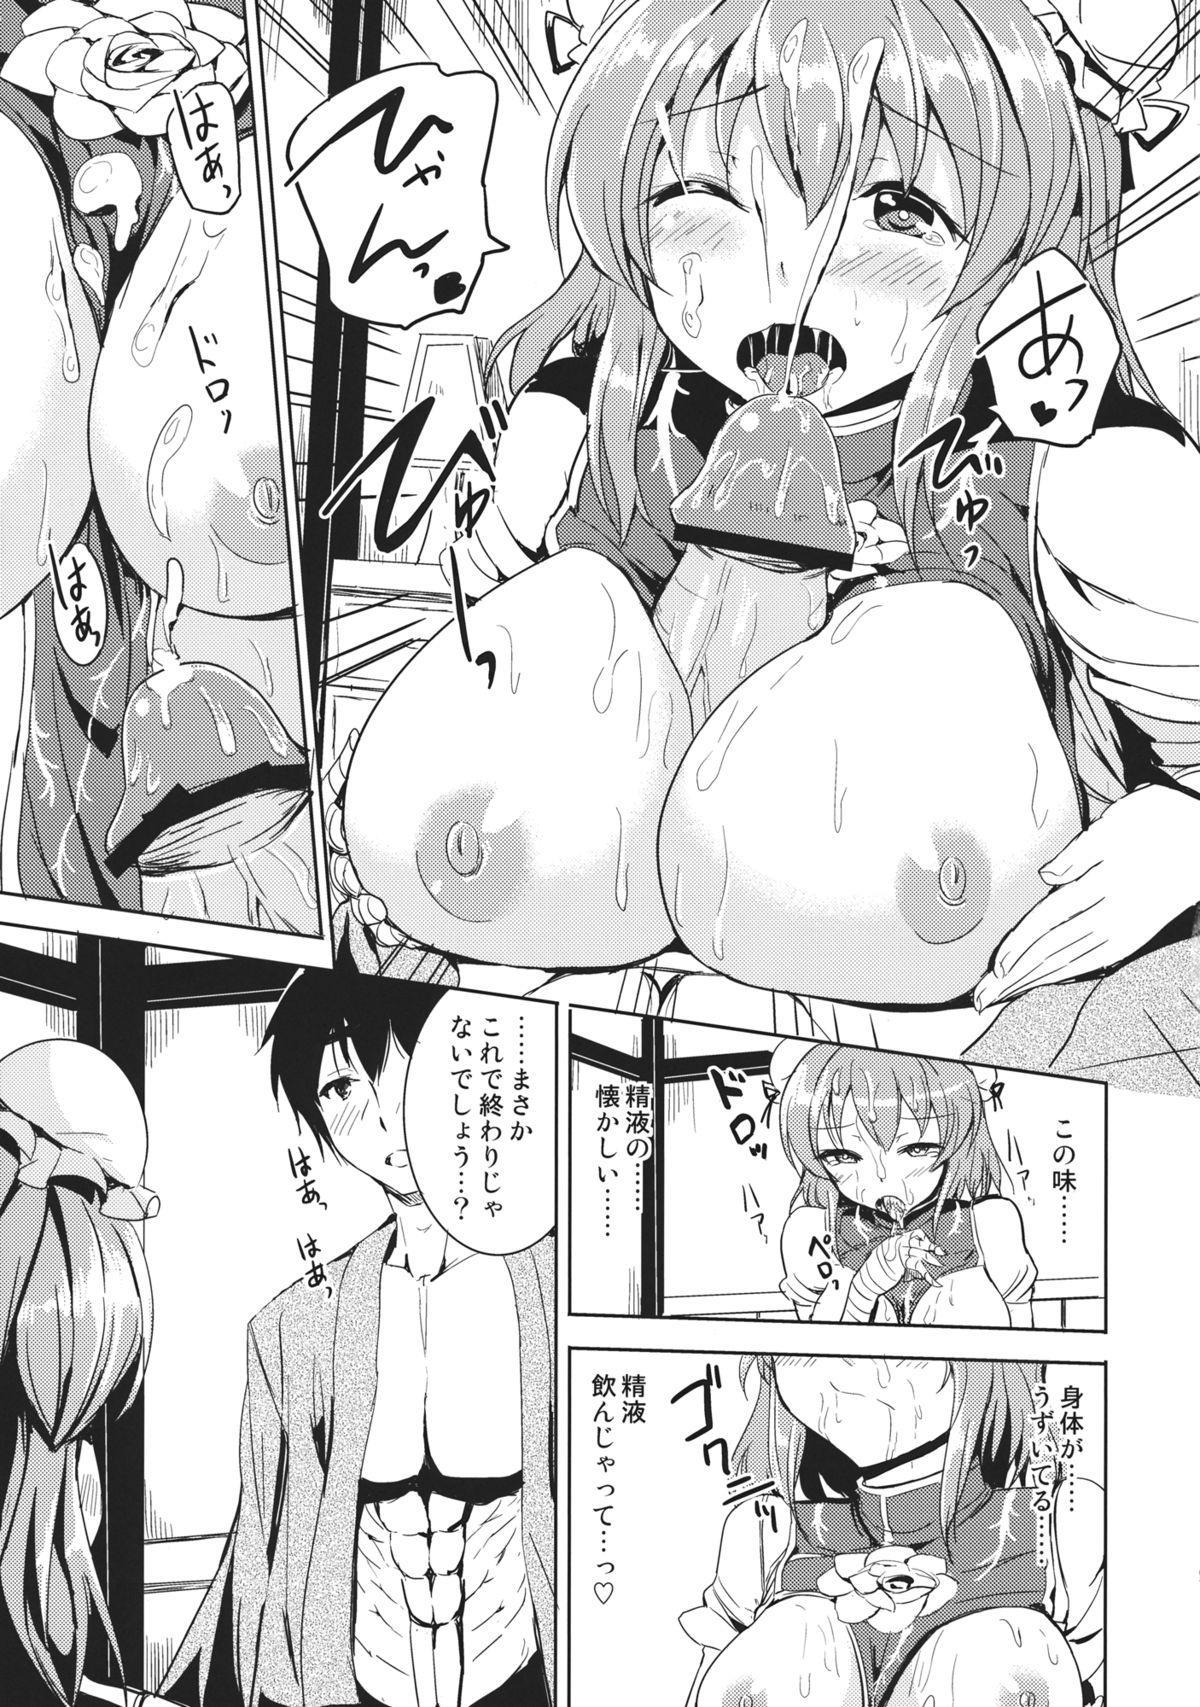 Gohoubi Kasen-sama! 8